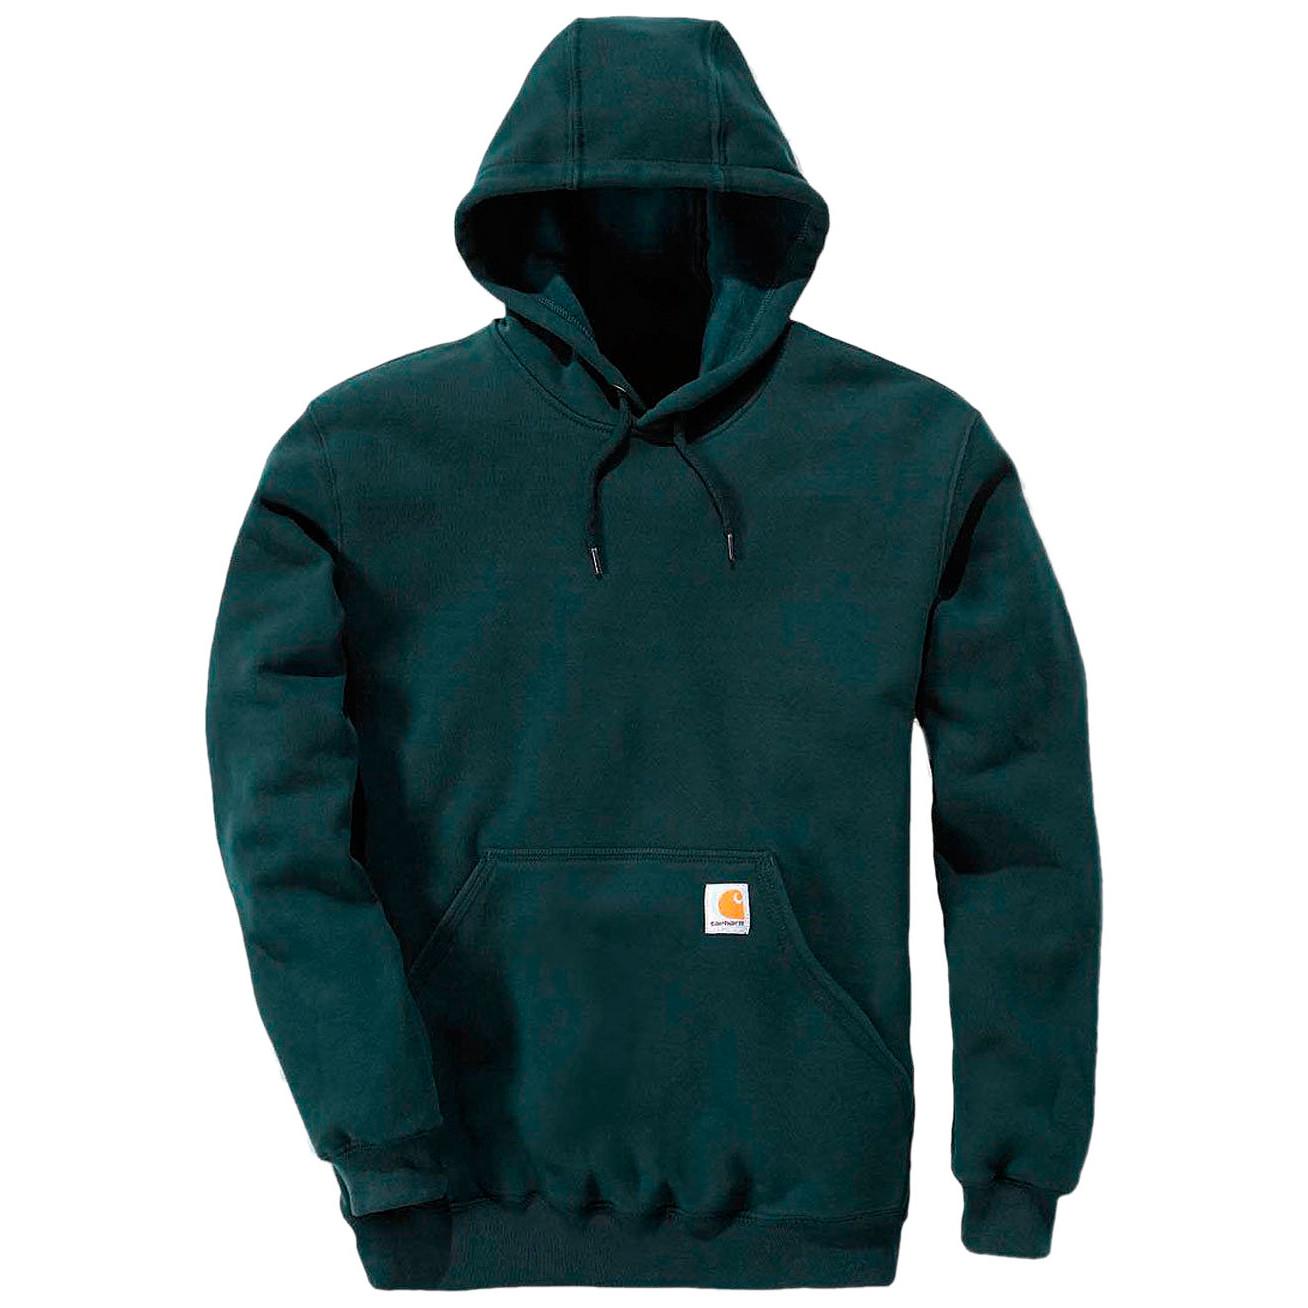 Худи Carhartt Hooded Sweatshirt - K121 (Canopy Green, S)